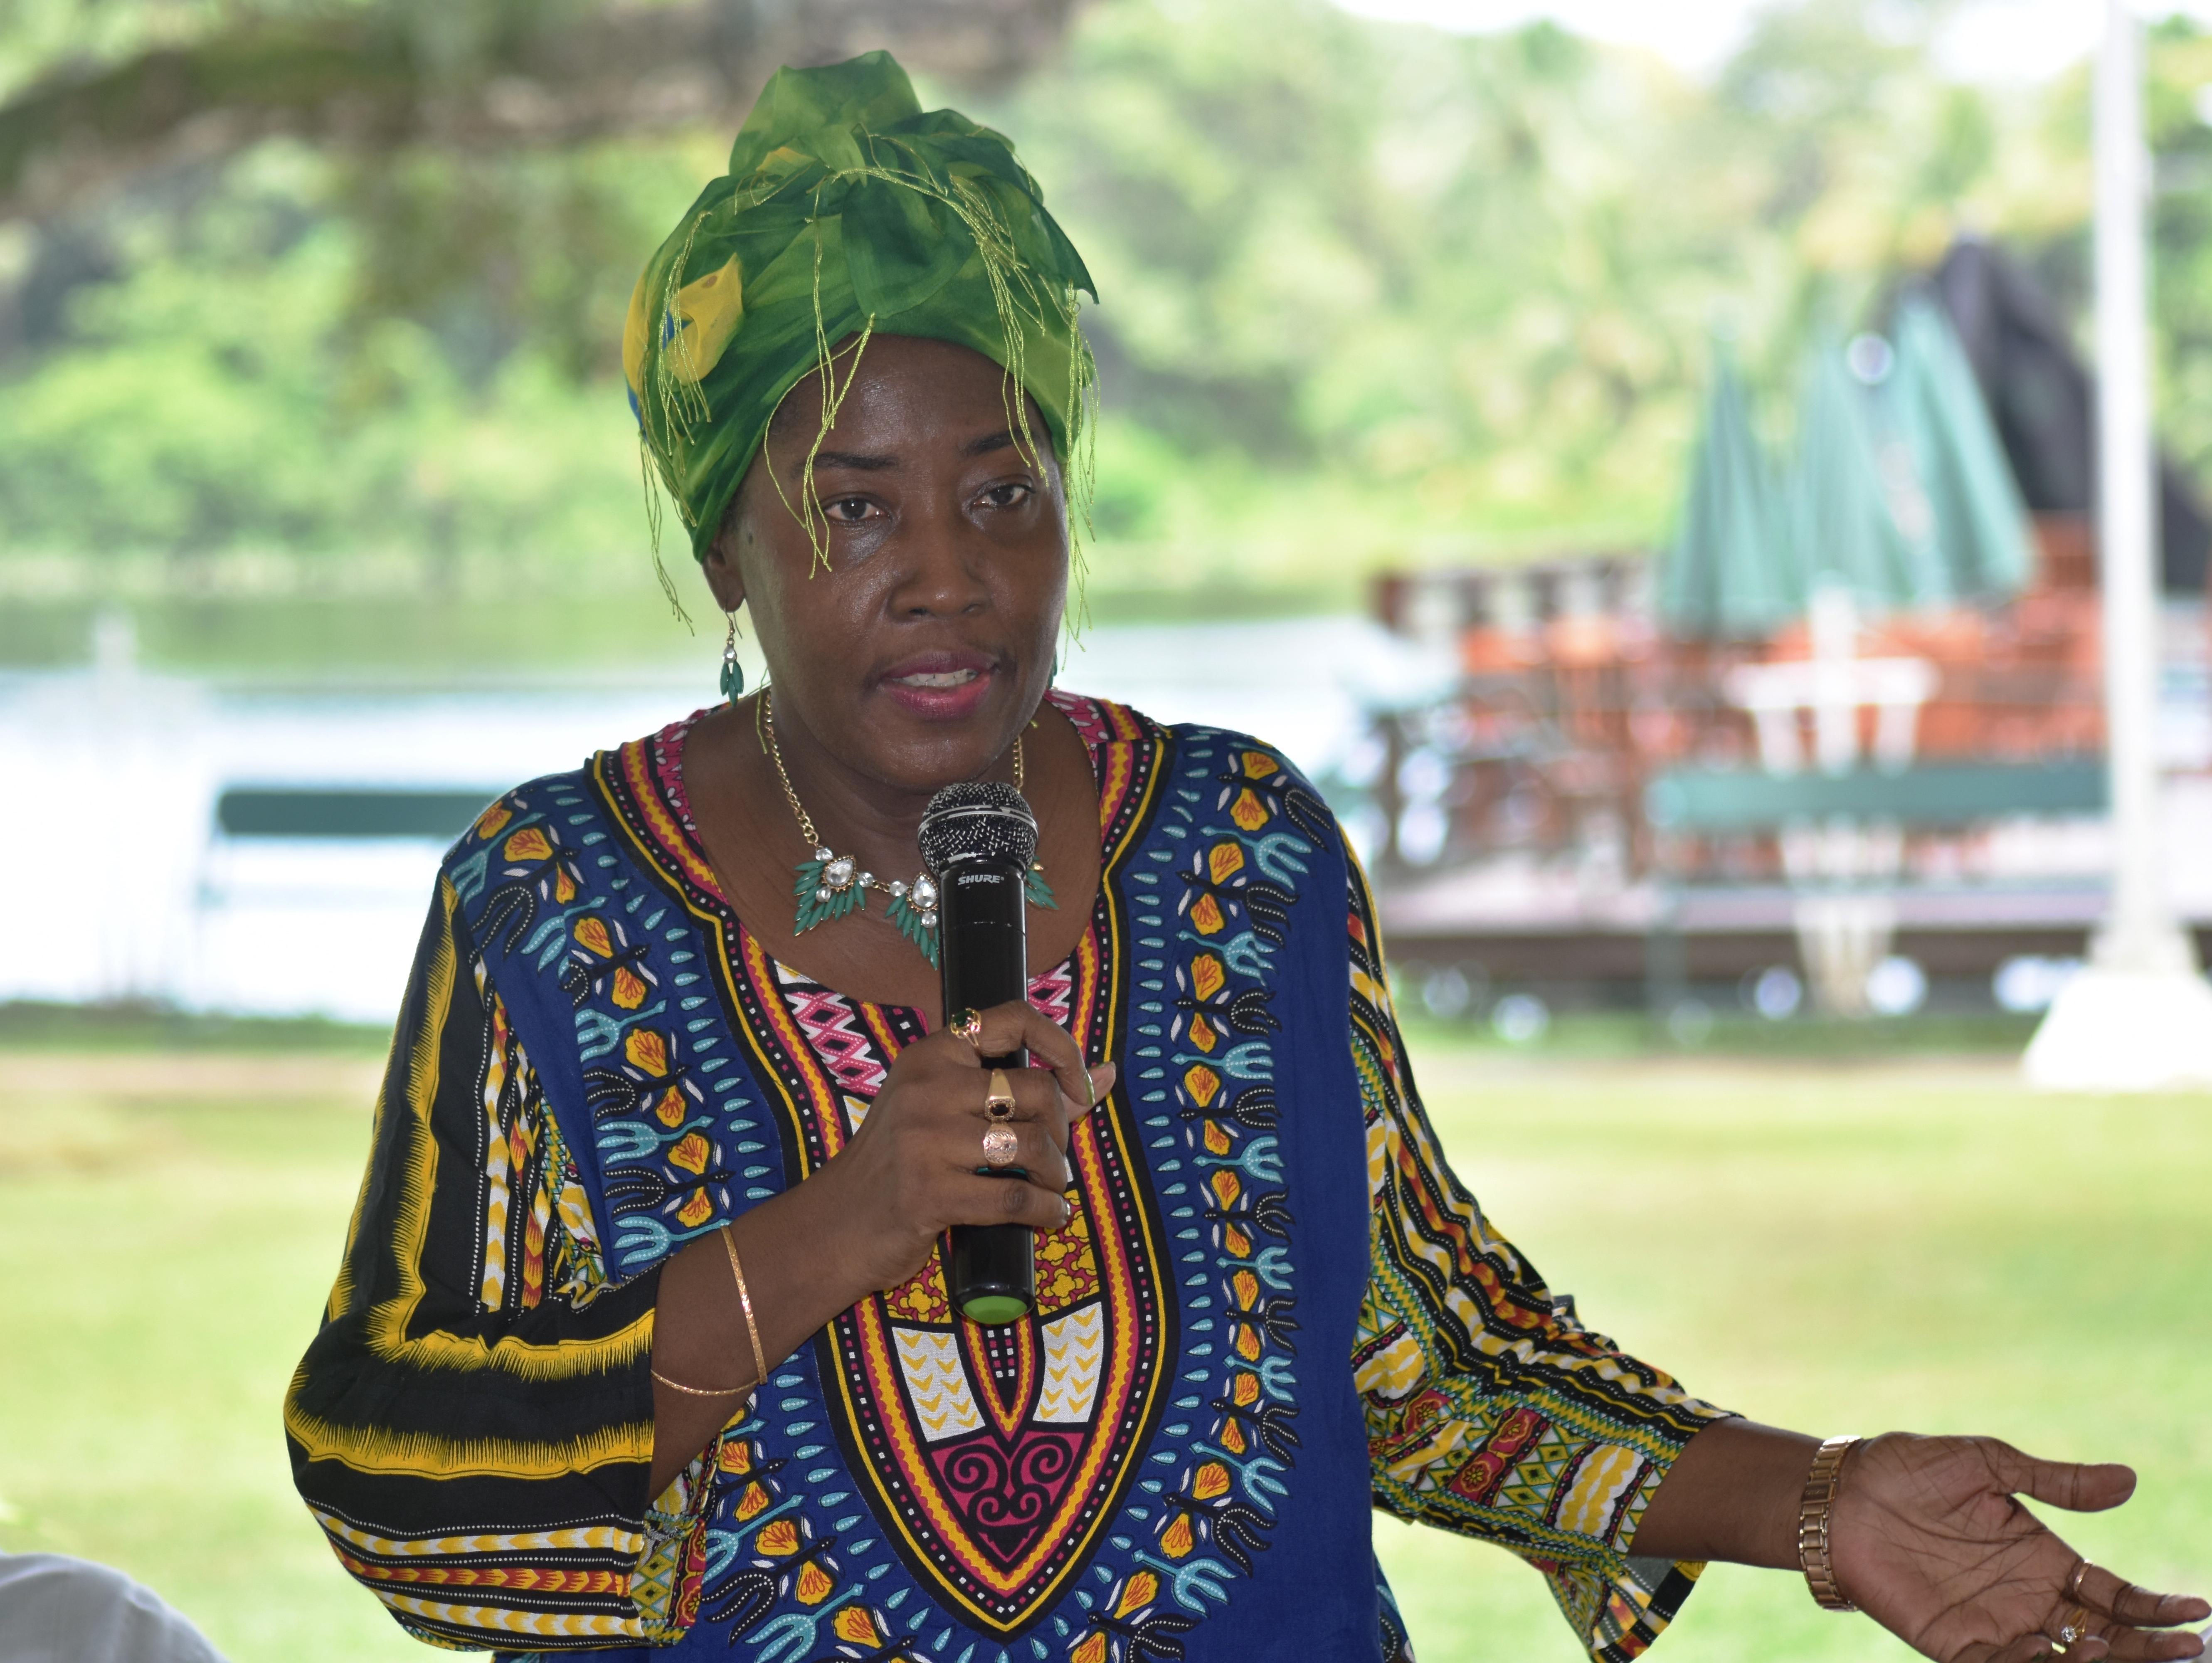 Minister Valerie Adams-Yearwood